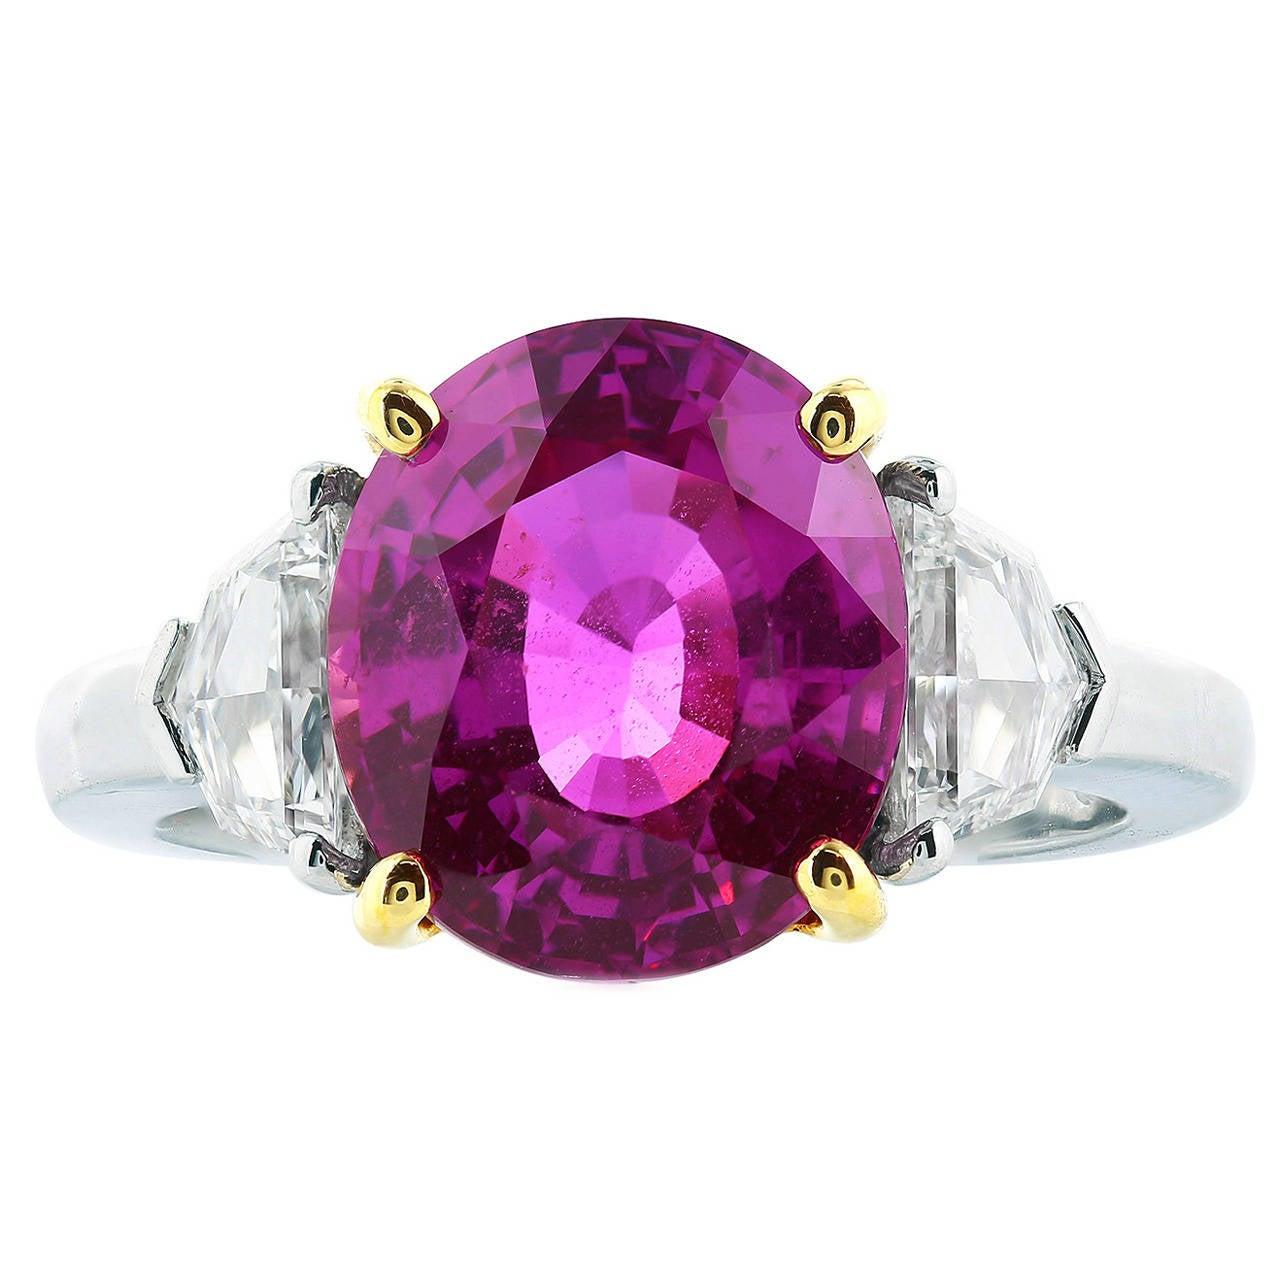 6.28 Carat Pink Sapphire Diamond Three-Stone Ring